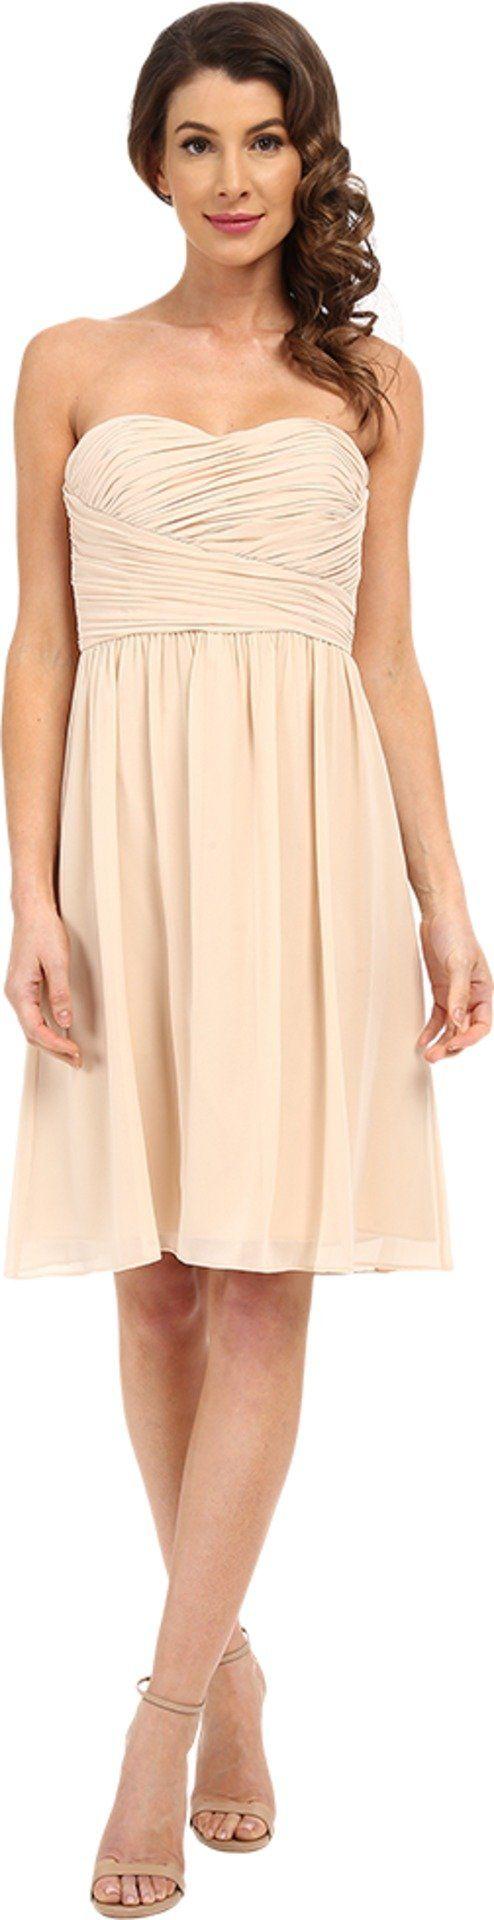 Donna Morgan Women's Sarah Dress Short Rouched Dress Champagne Dress